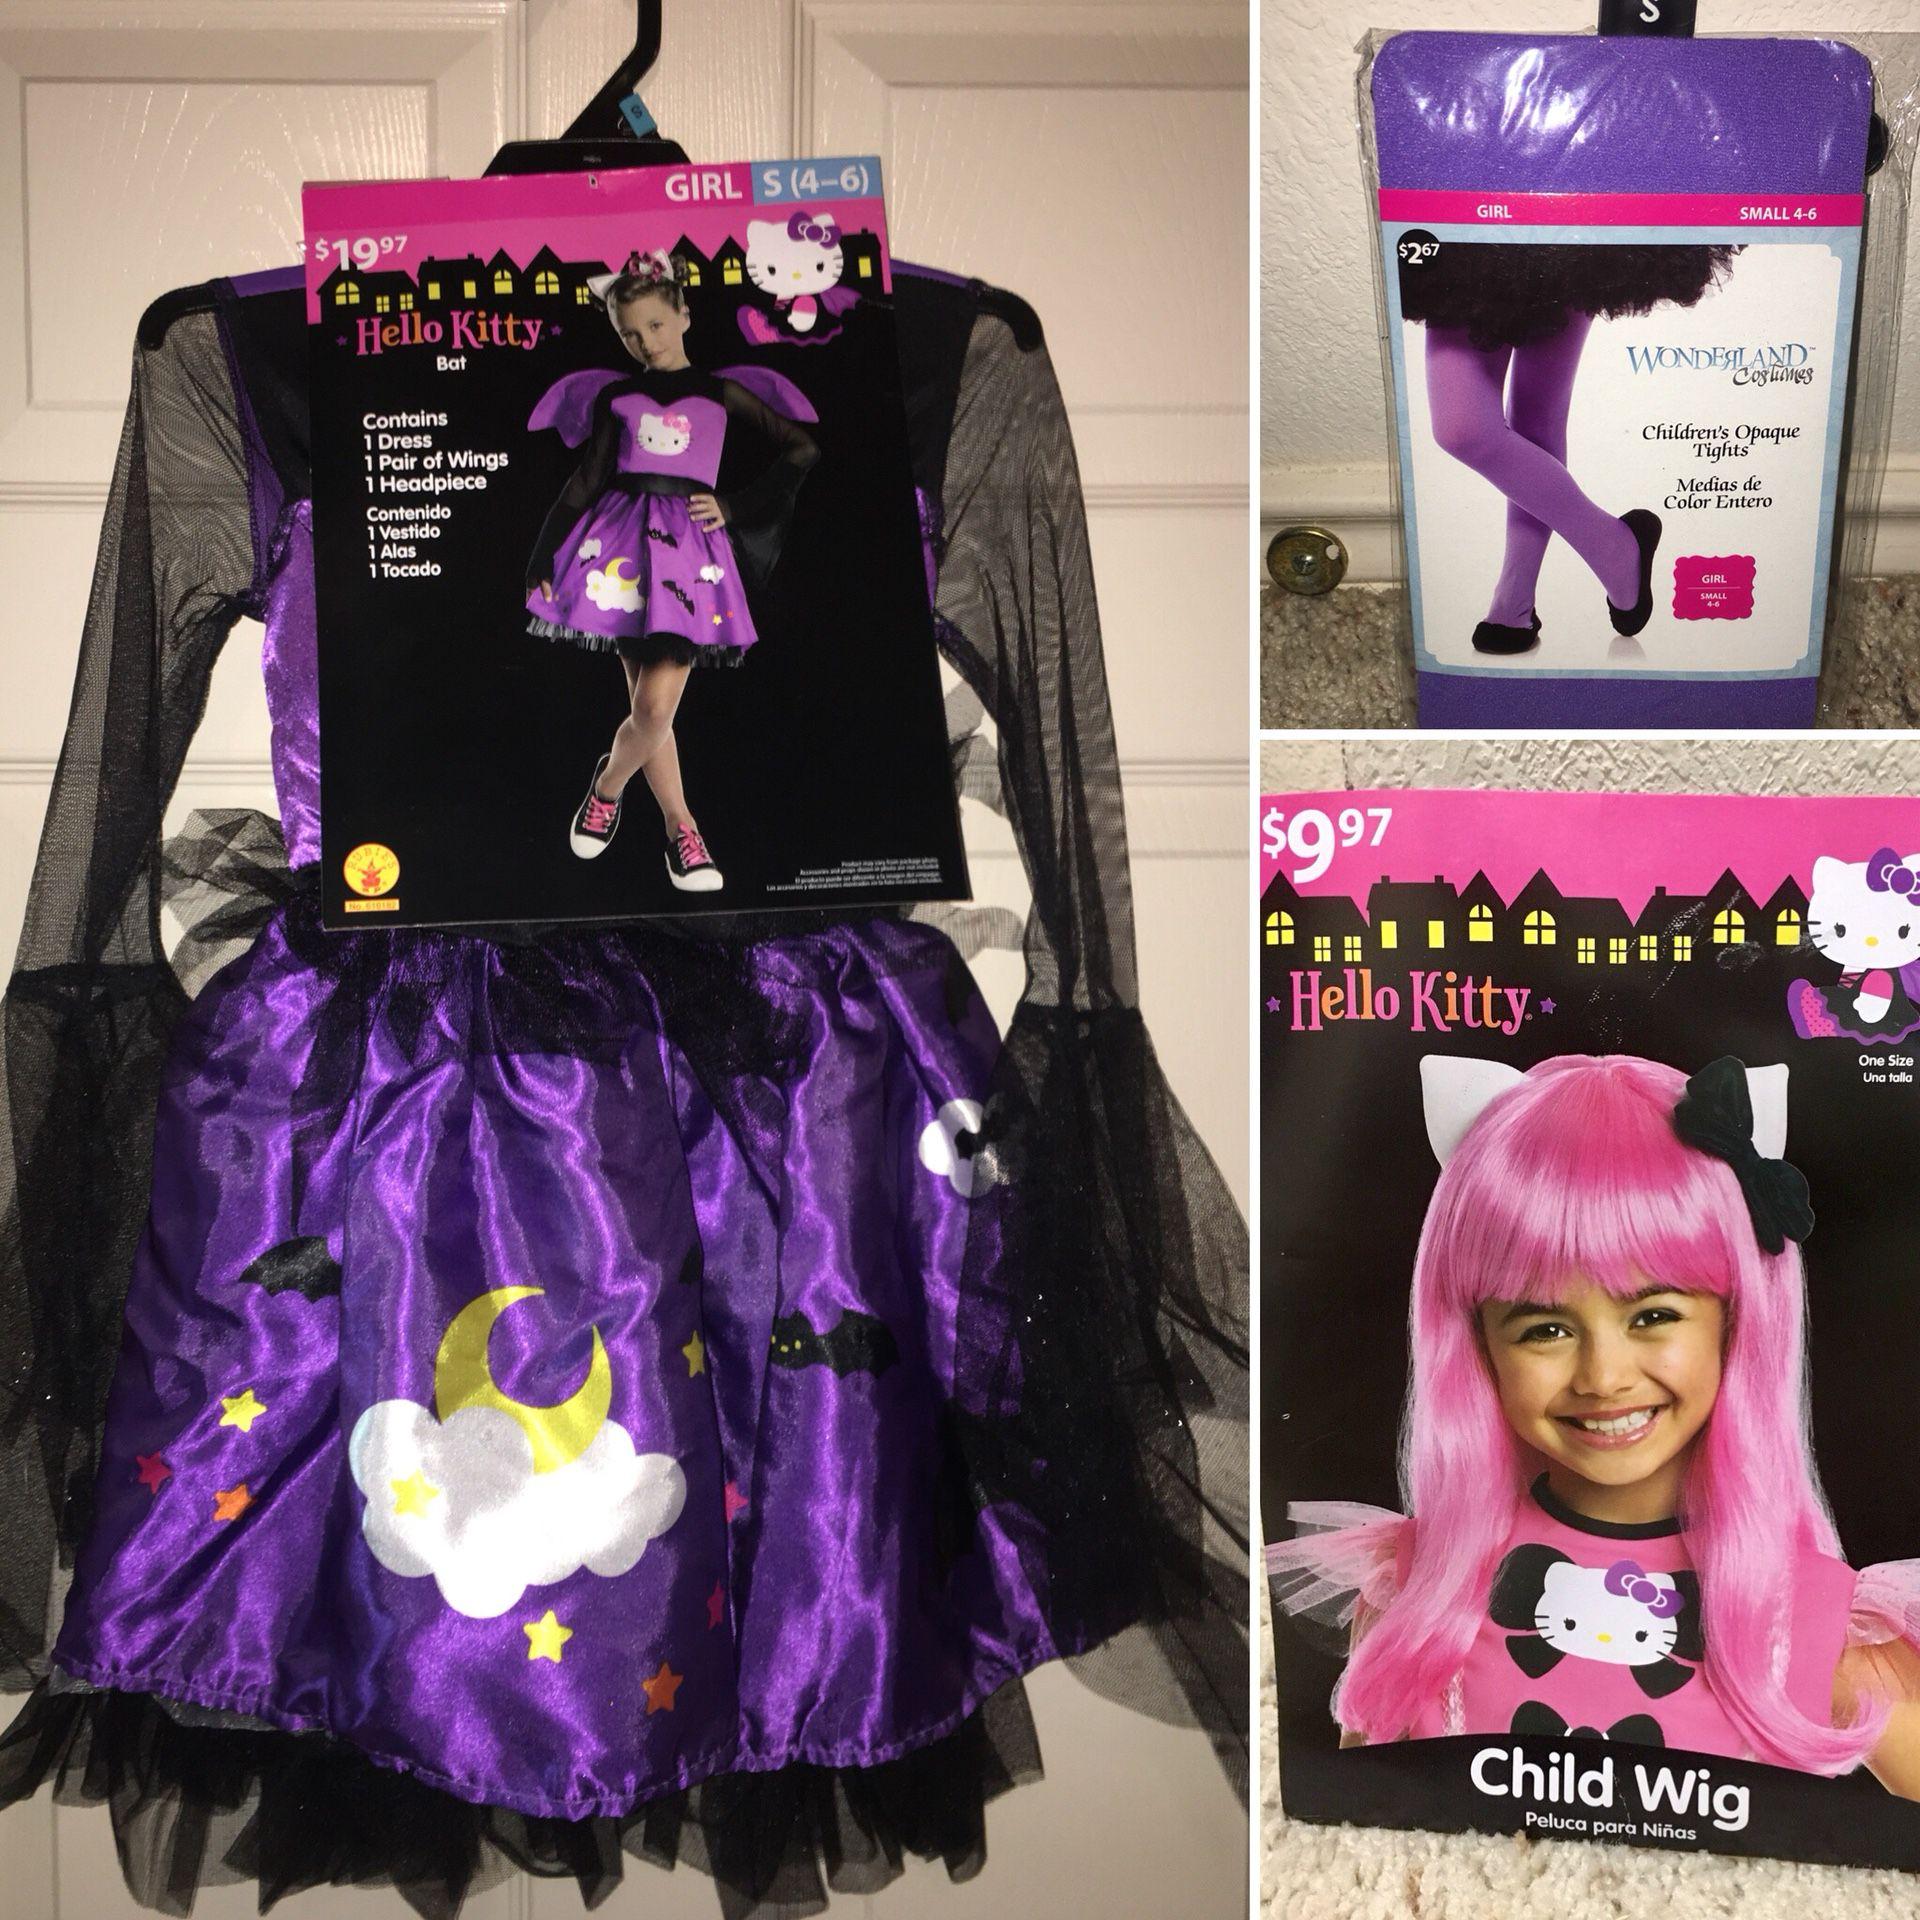 Hello Kitty Bat Costume $12, Purple Tights $3, Wig $5 (All Brand New)